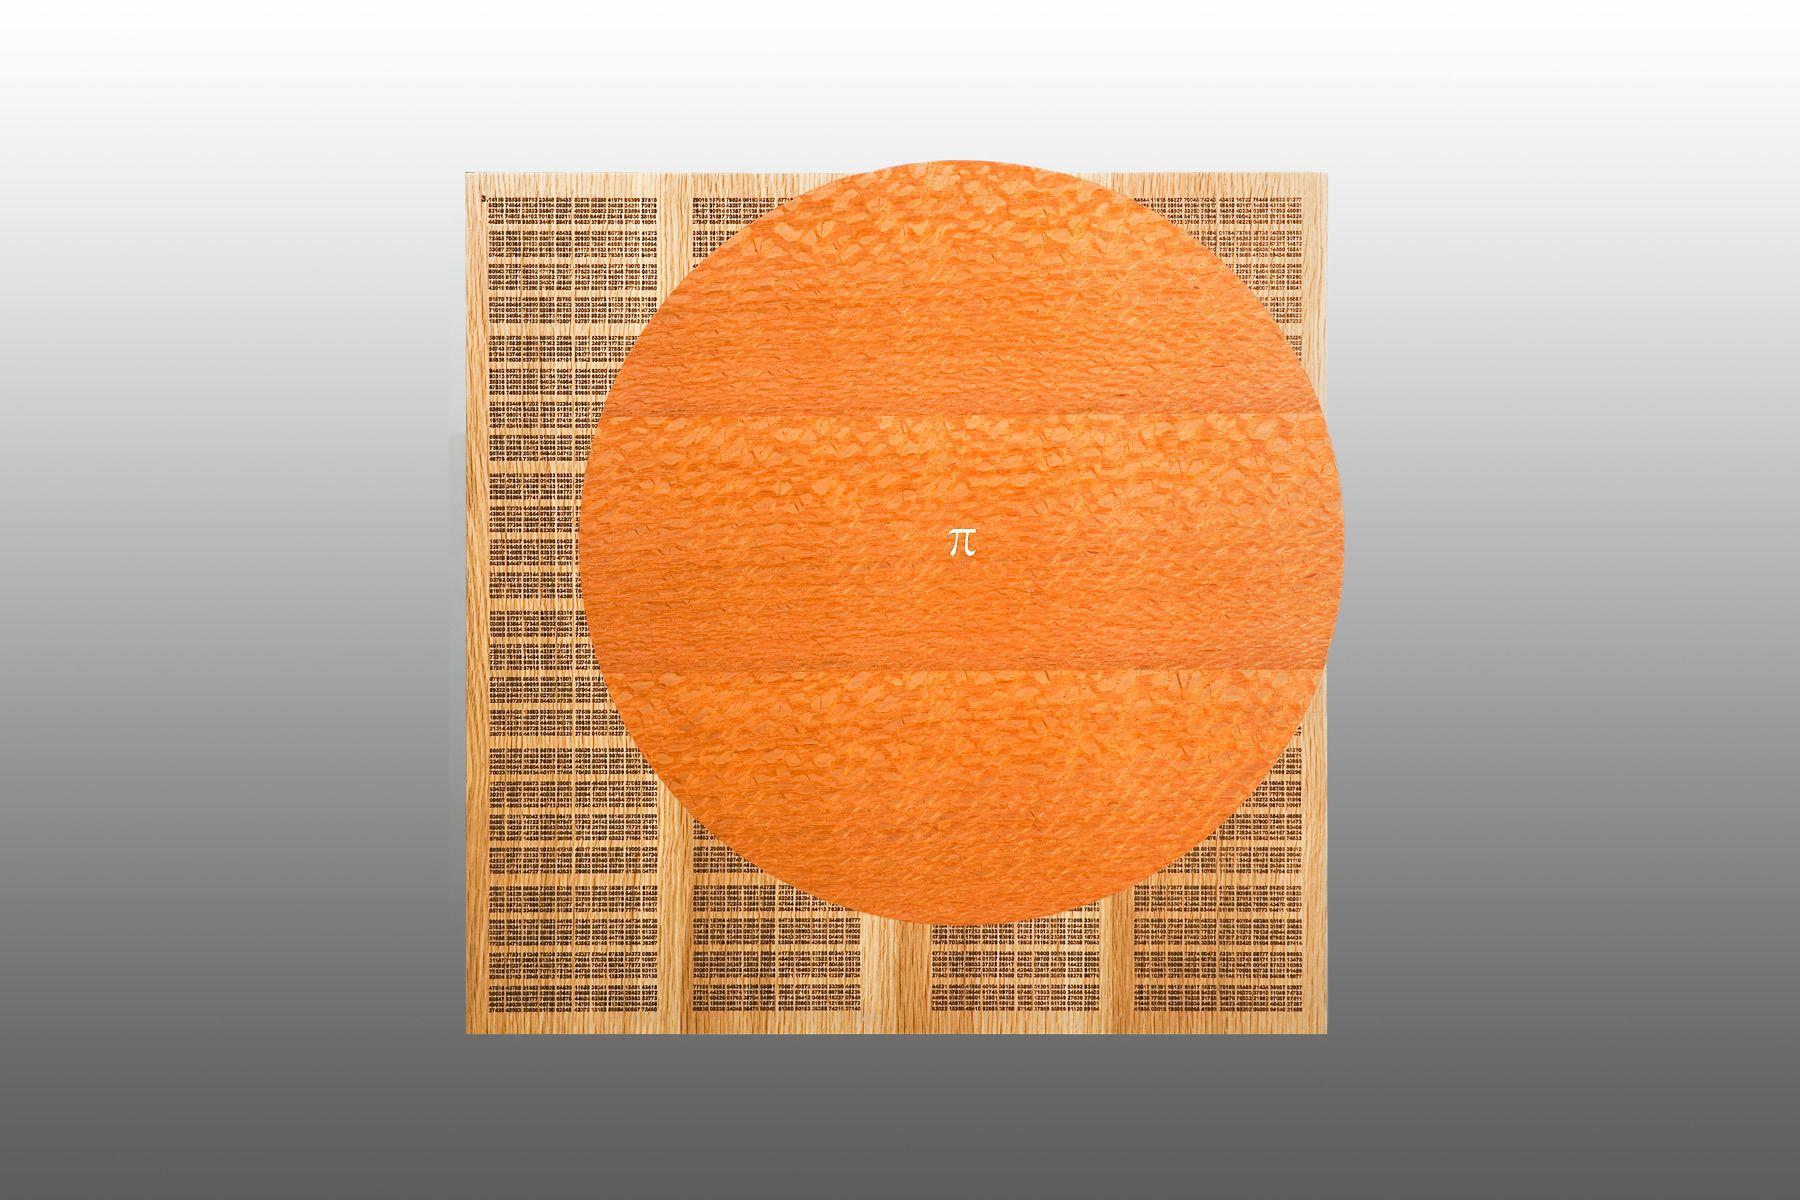 1aaron_levine_contemporary_modern_studio_furniture_maker_wood_woodworker_art_artist_northwest_parquetry_decorative_mathematical_pi_table_detail3.jpg